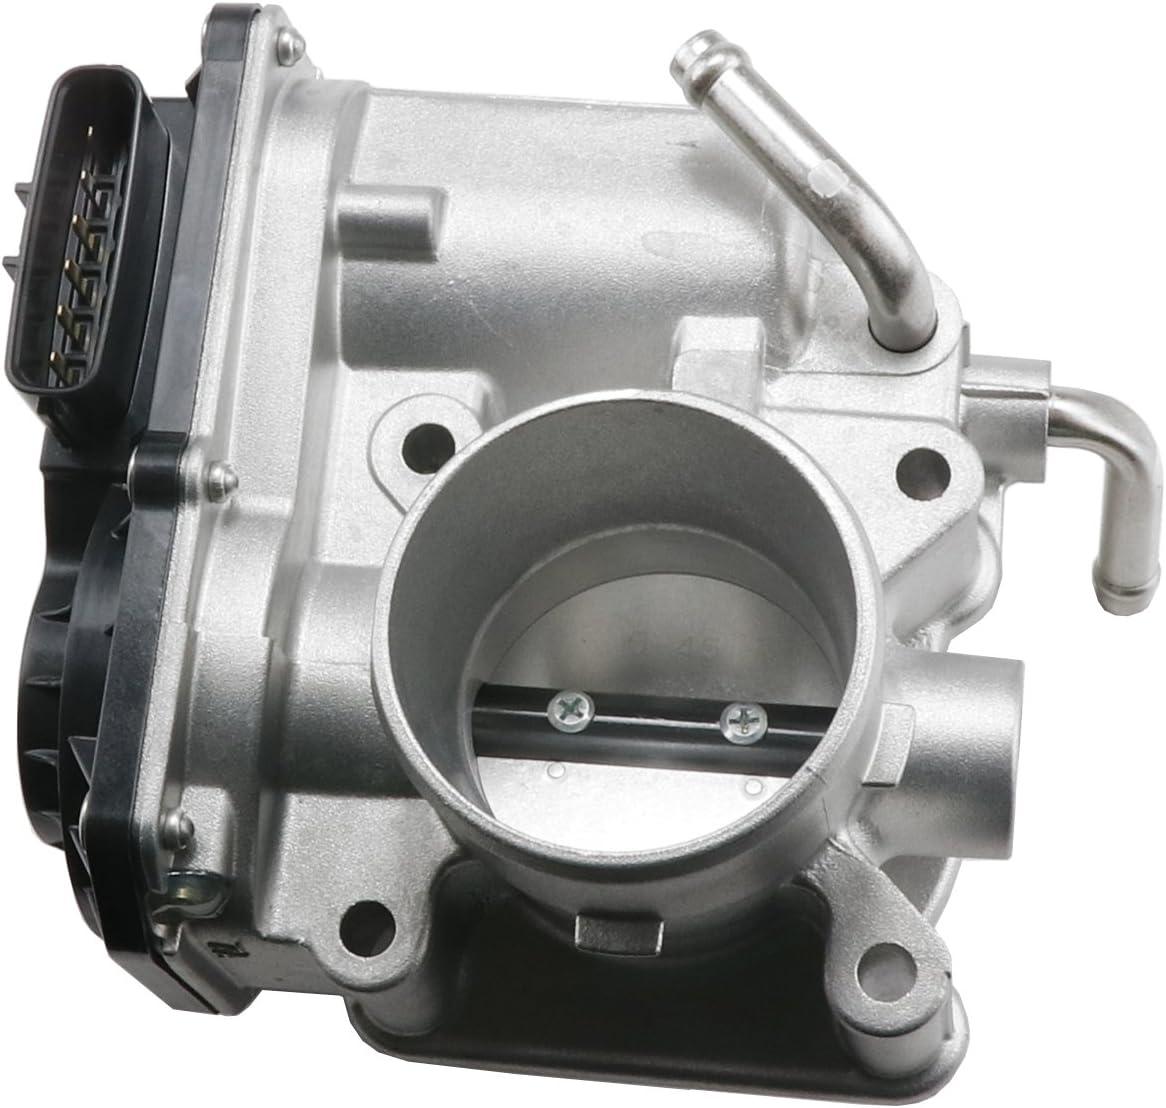 BECKARNLEY 154-0167 Throttle Body 1 Pack